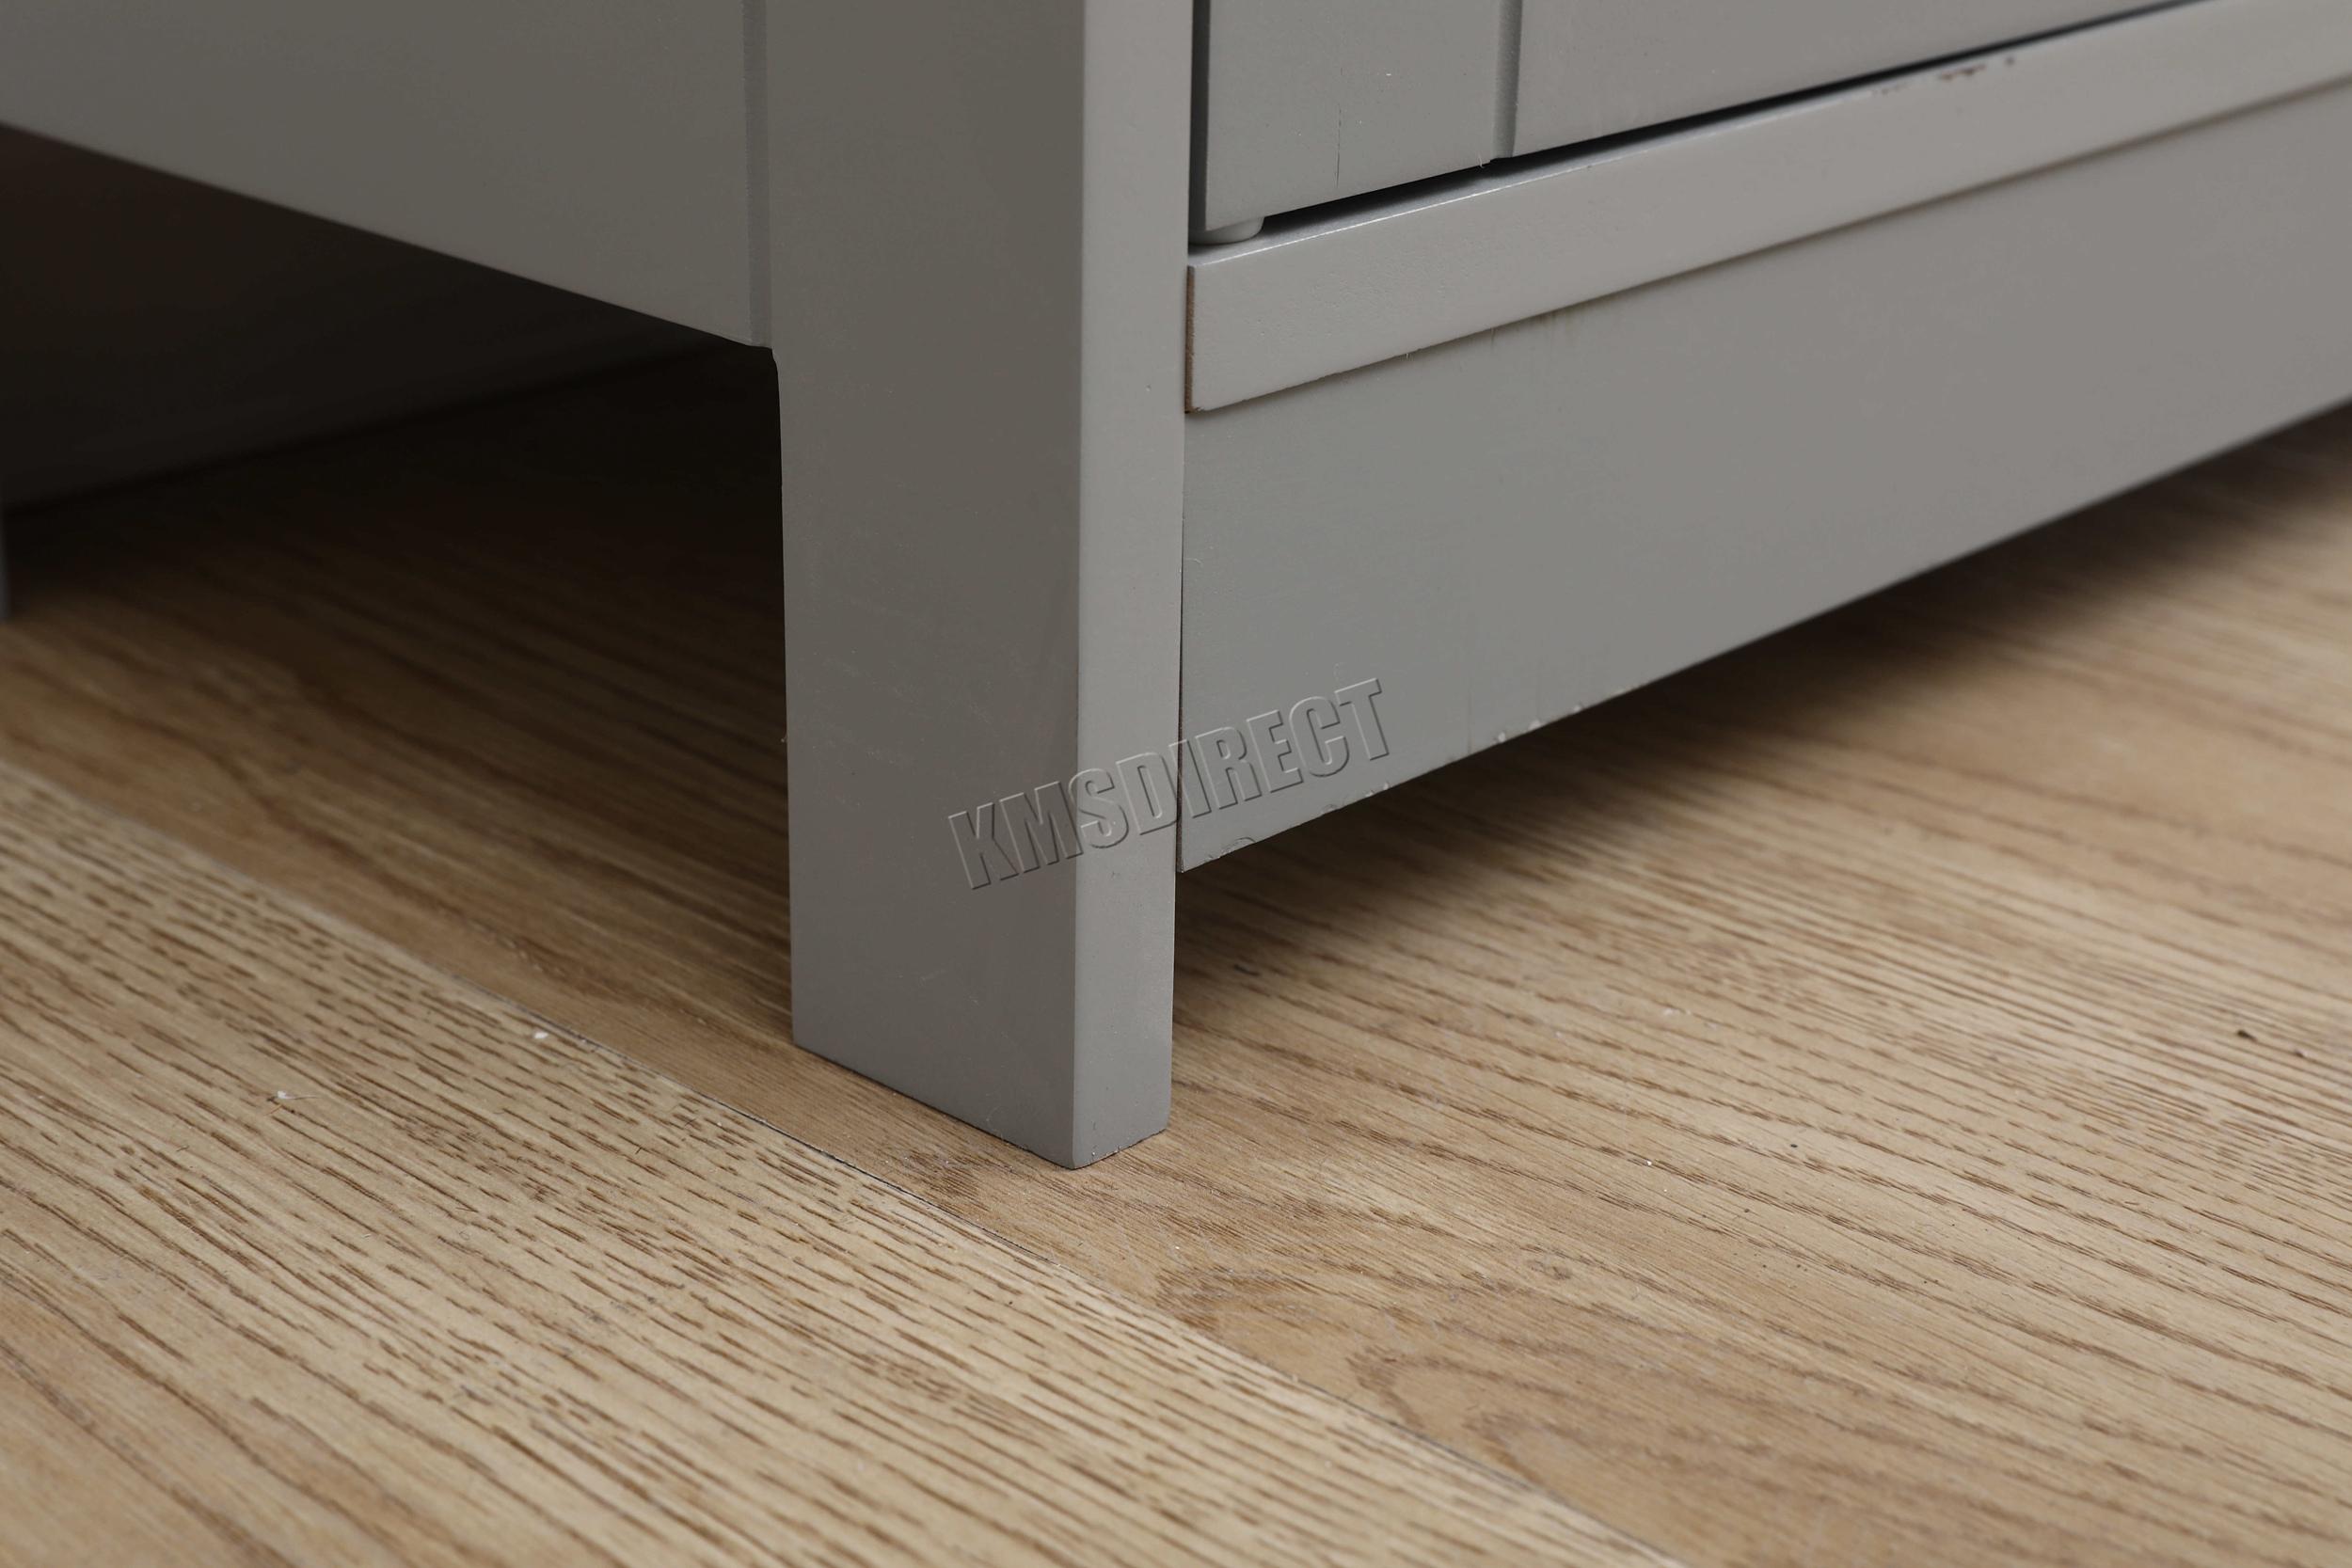 WestWood-Vanity-Unit-Wooden-Under-Sink-Wash-Basin-Bathroom-Cabinet-Storage thumbnail 19